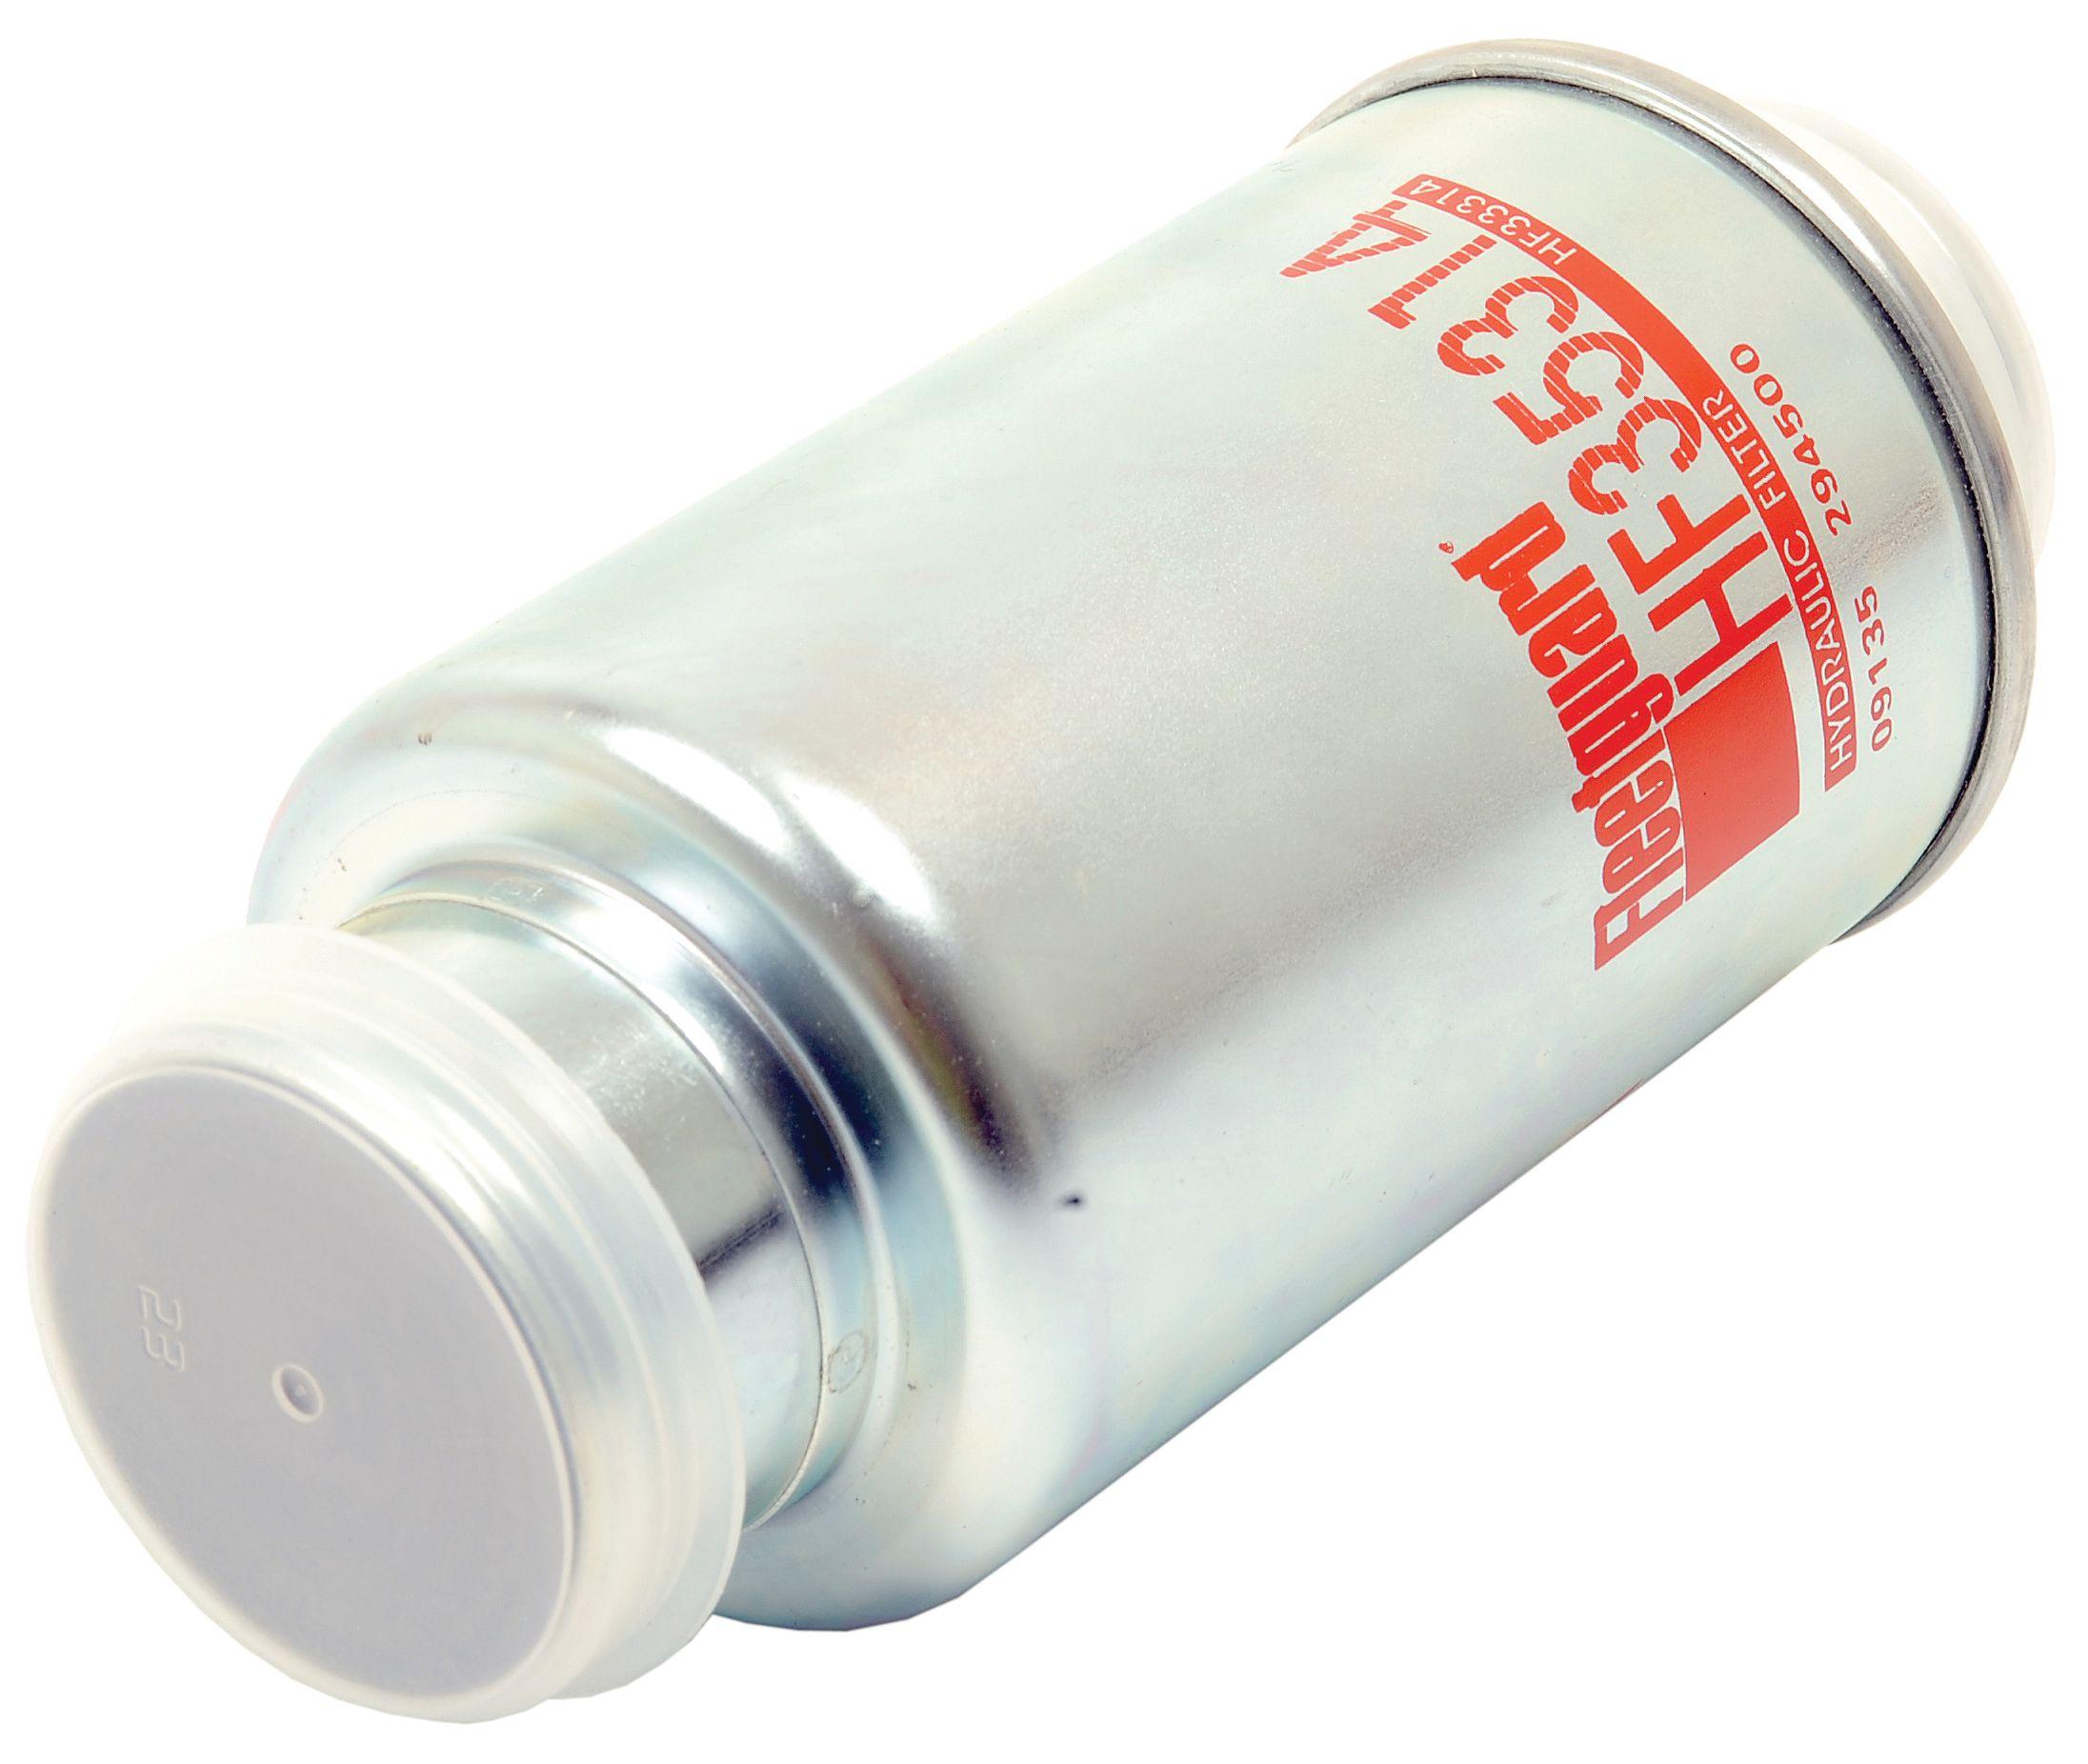 RENAULT HYDRAULIC FILTER HF35314 109249